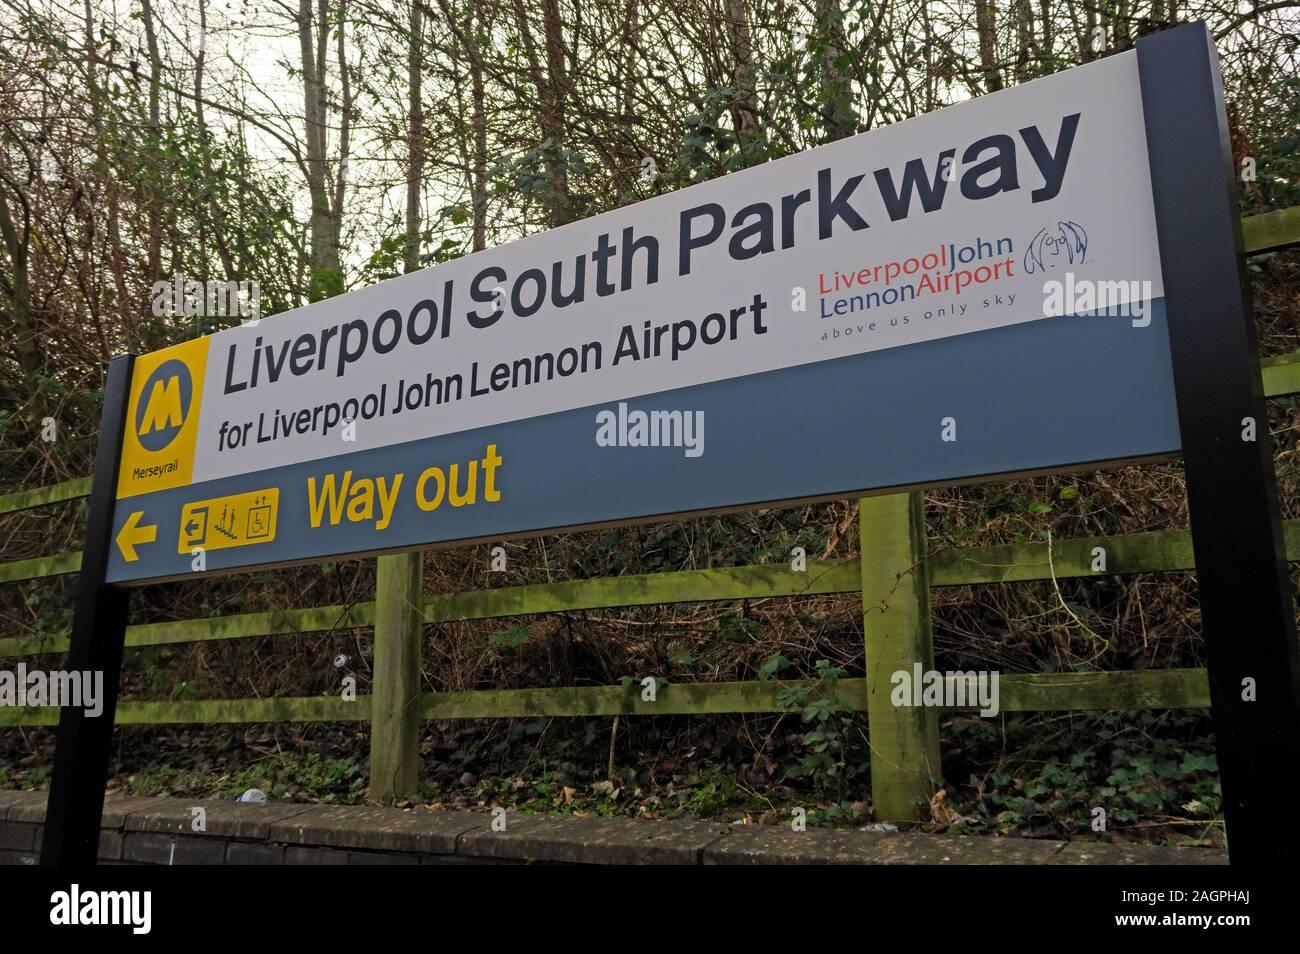 Dieses Stockfoto: Liverpool South Parkway, zum Flughafen Liverpool John Lennon, Merseyrail, Garston, Merseyside, North West England, UK-LPY - 2AGPHA